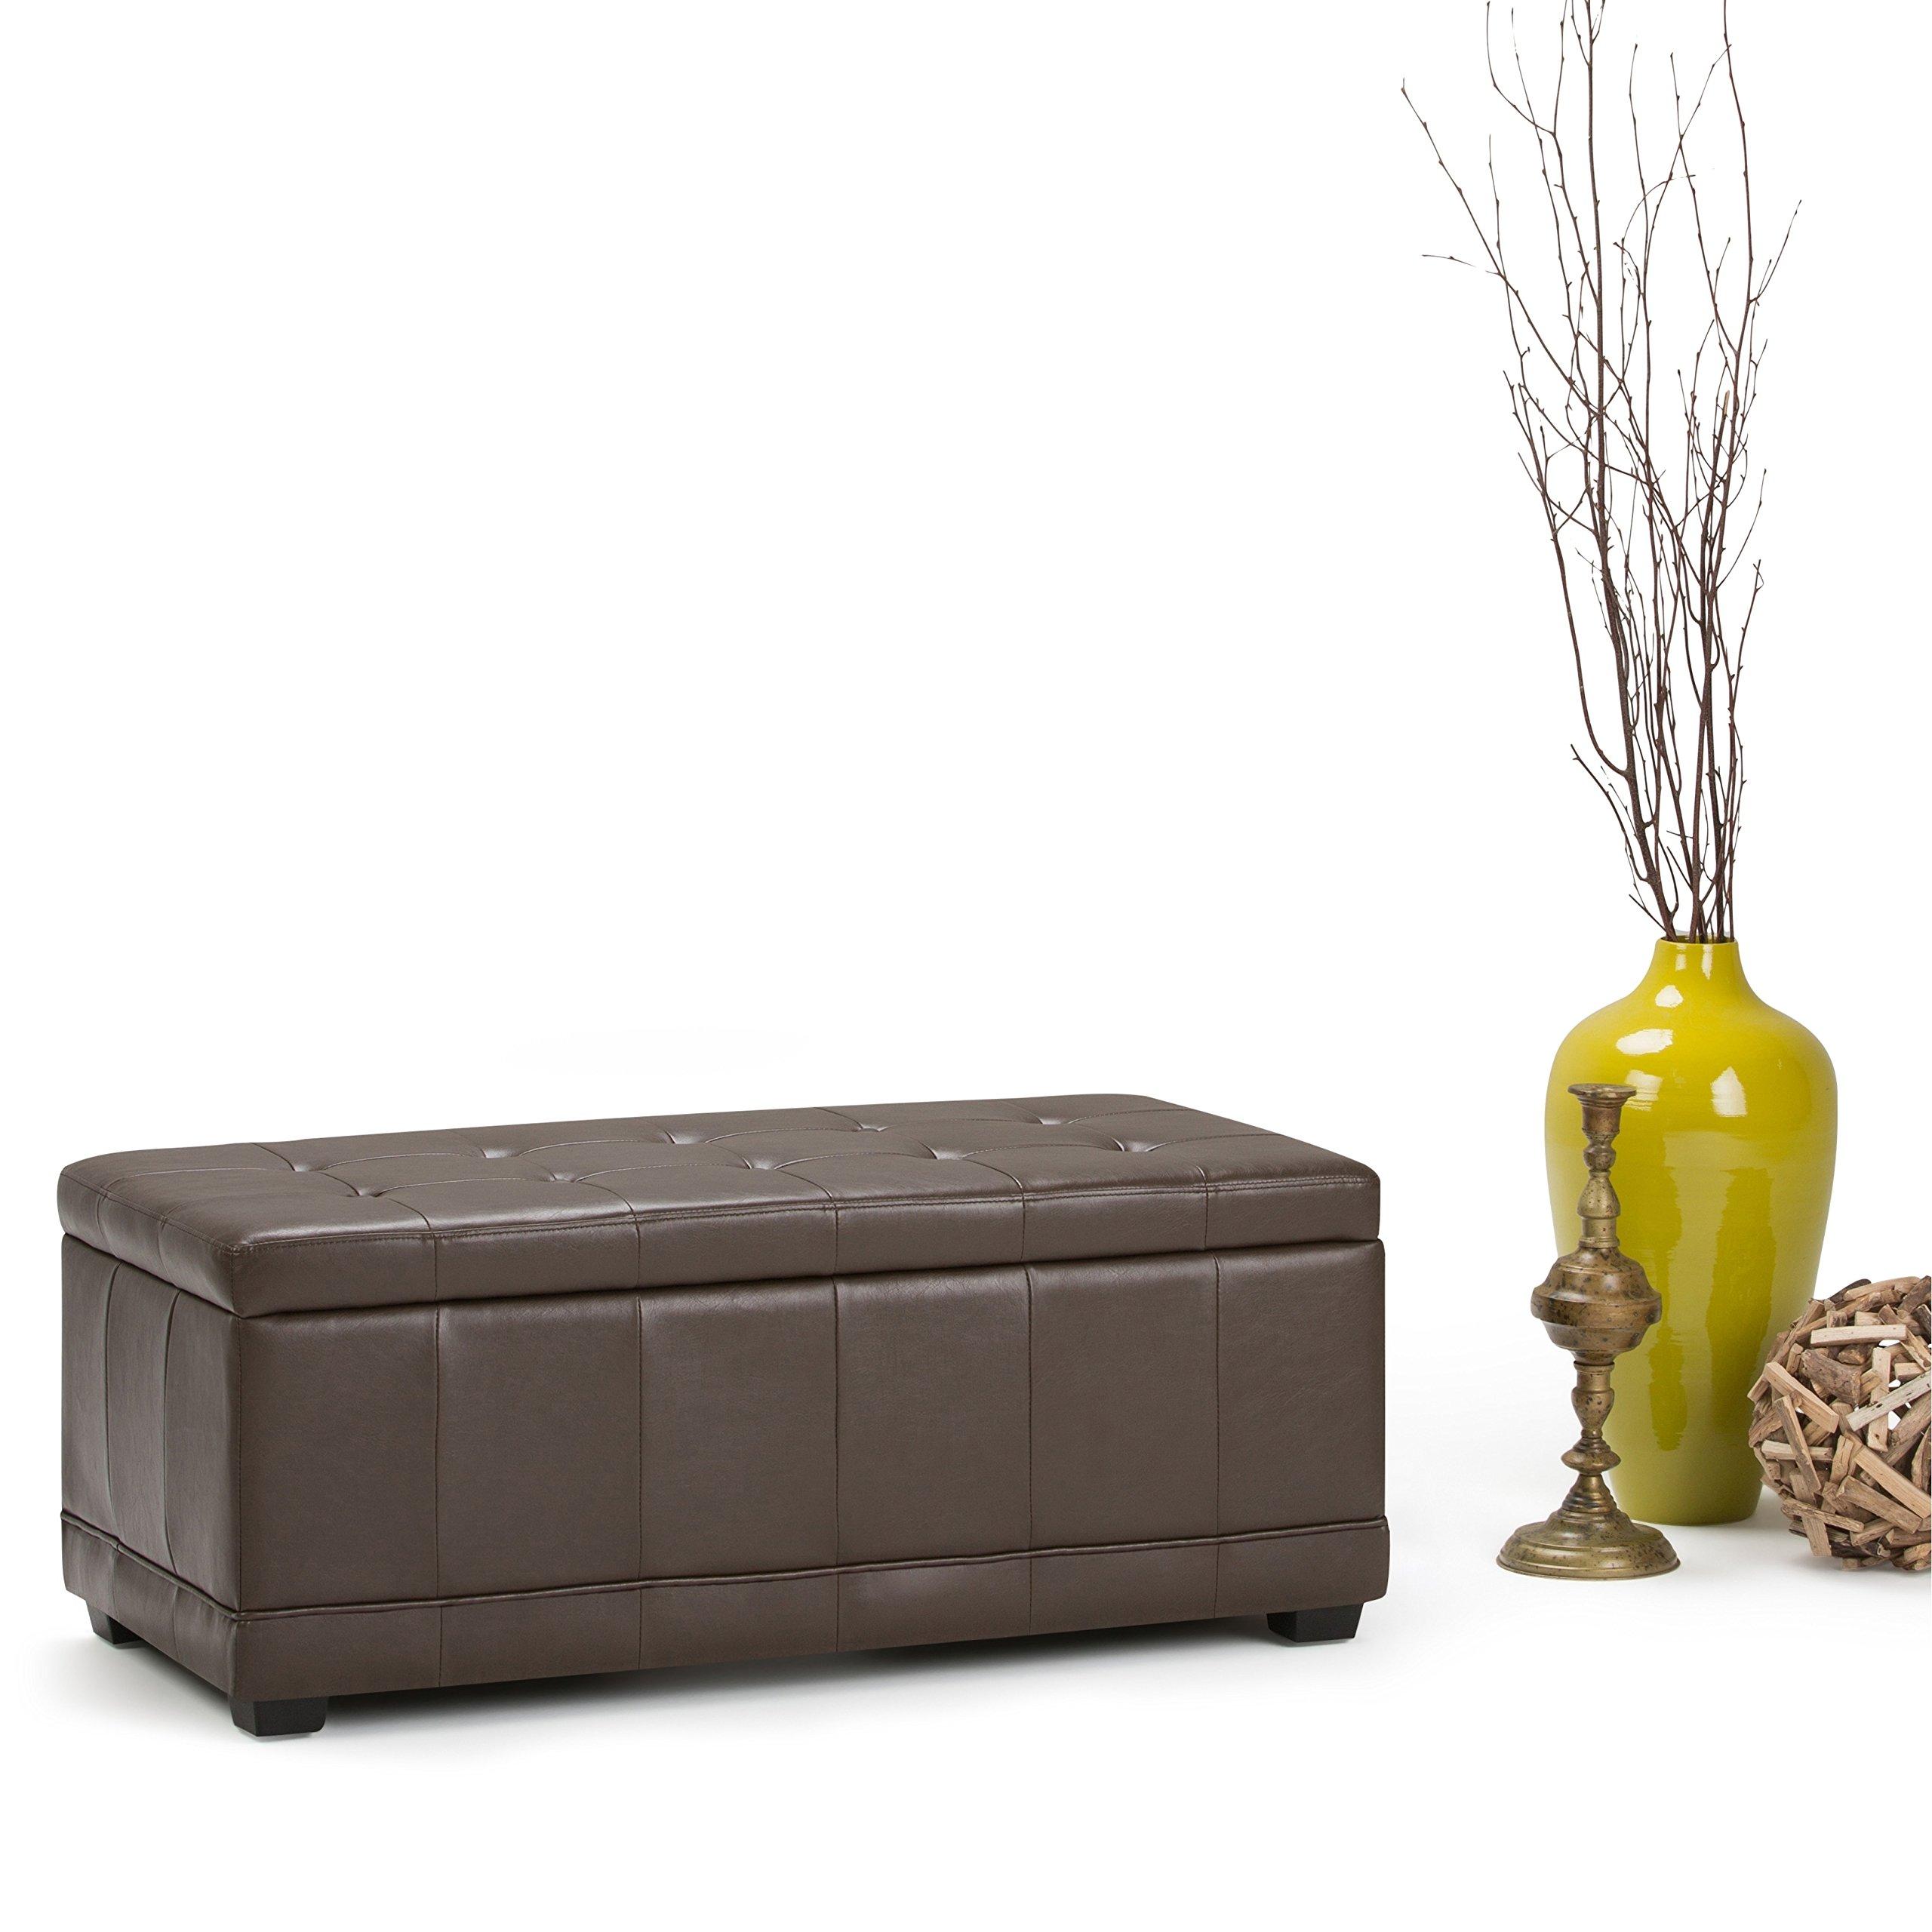 WyndenHall Norwood Storage Ottoman Bench Chocolate Brown Faux Leather, Wood, Foam